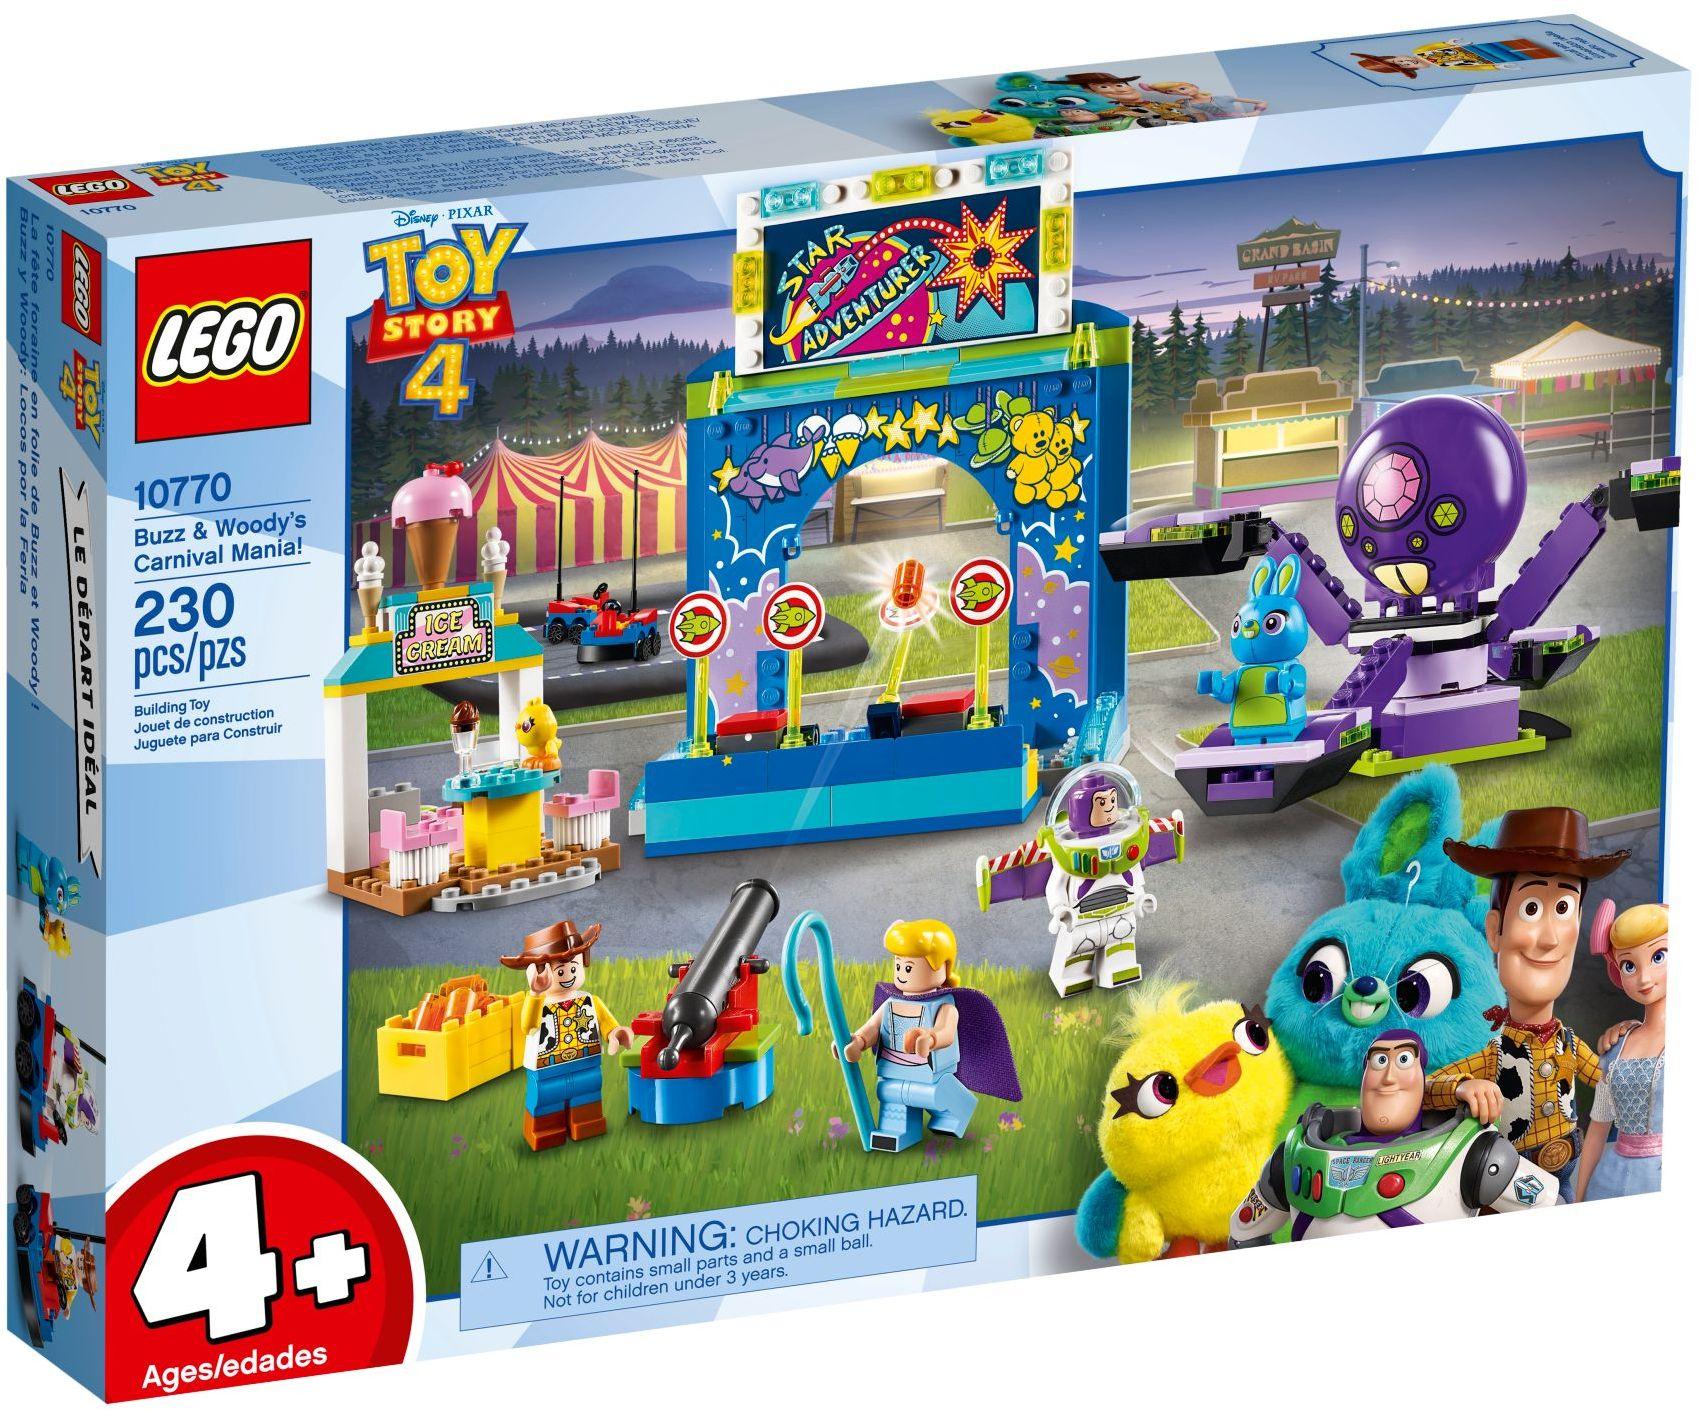 LEGO Disney - Toy Story 4 Buzz & Woody's Carnival Mania! (10770)